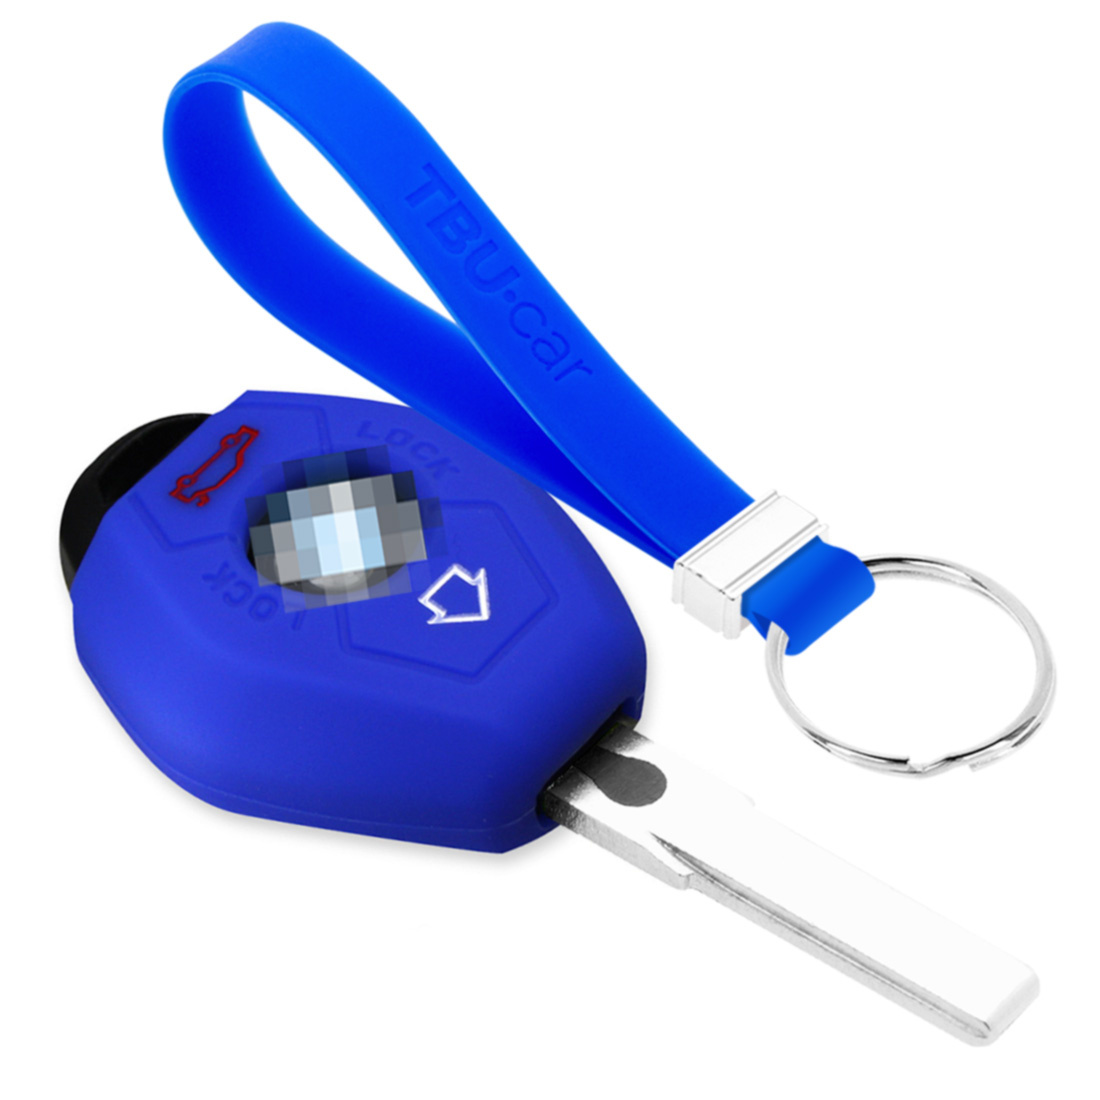 TBU car TBU car Autoschlüssel Hülle kompatibel mit BMW 3 Tasten - Schutzhülle aus Silikon - Auto Schlüsselhülle Cover in Blau